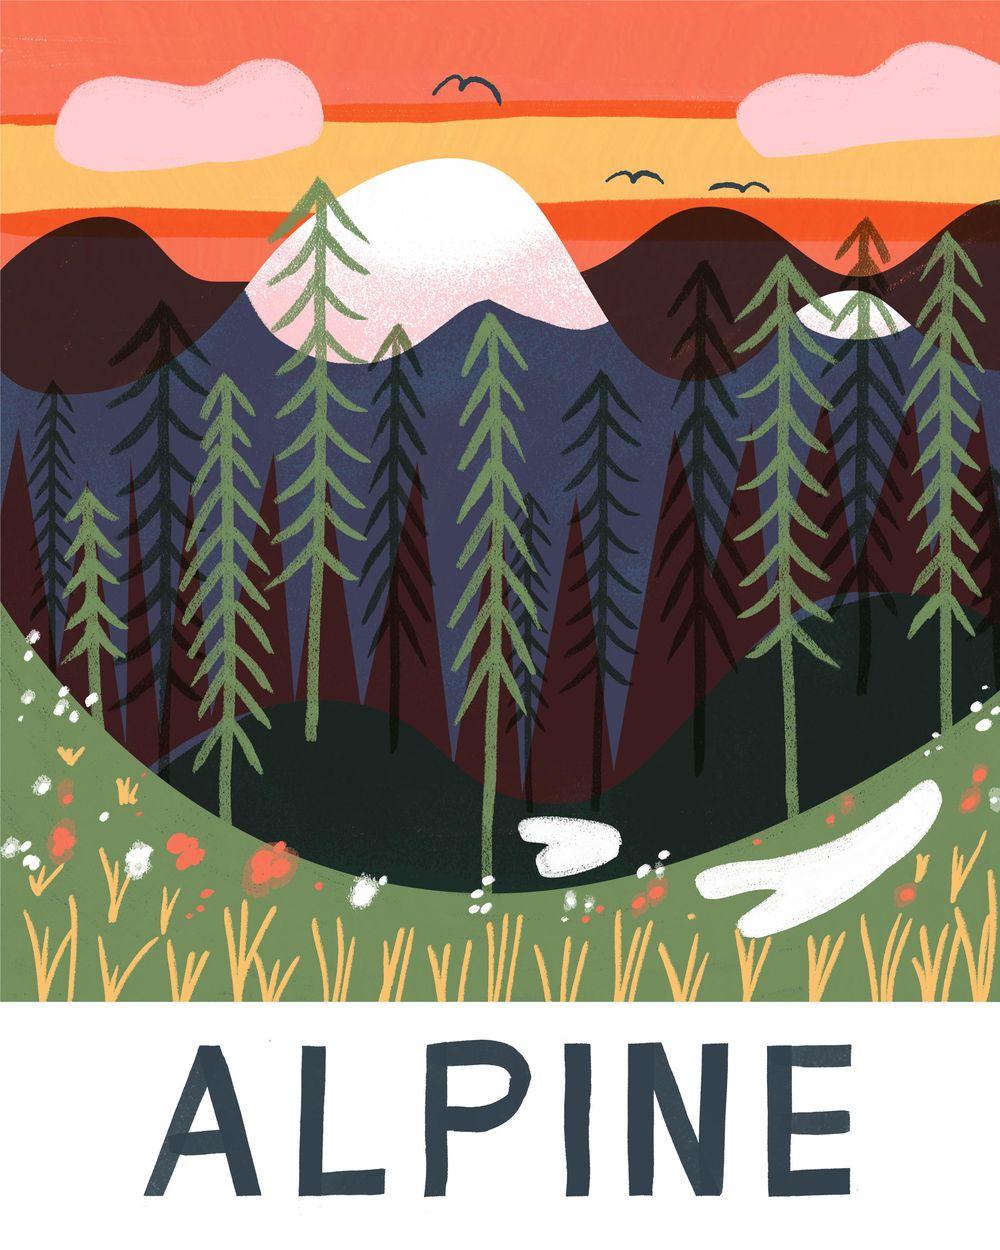 Alpine excersice - image 1 - student project